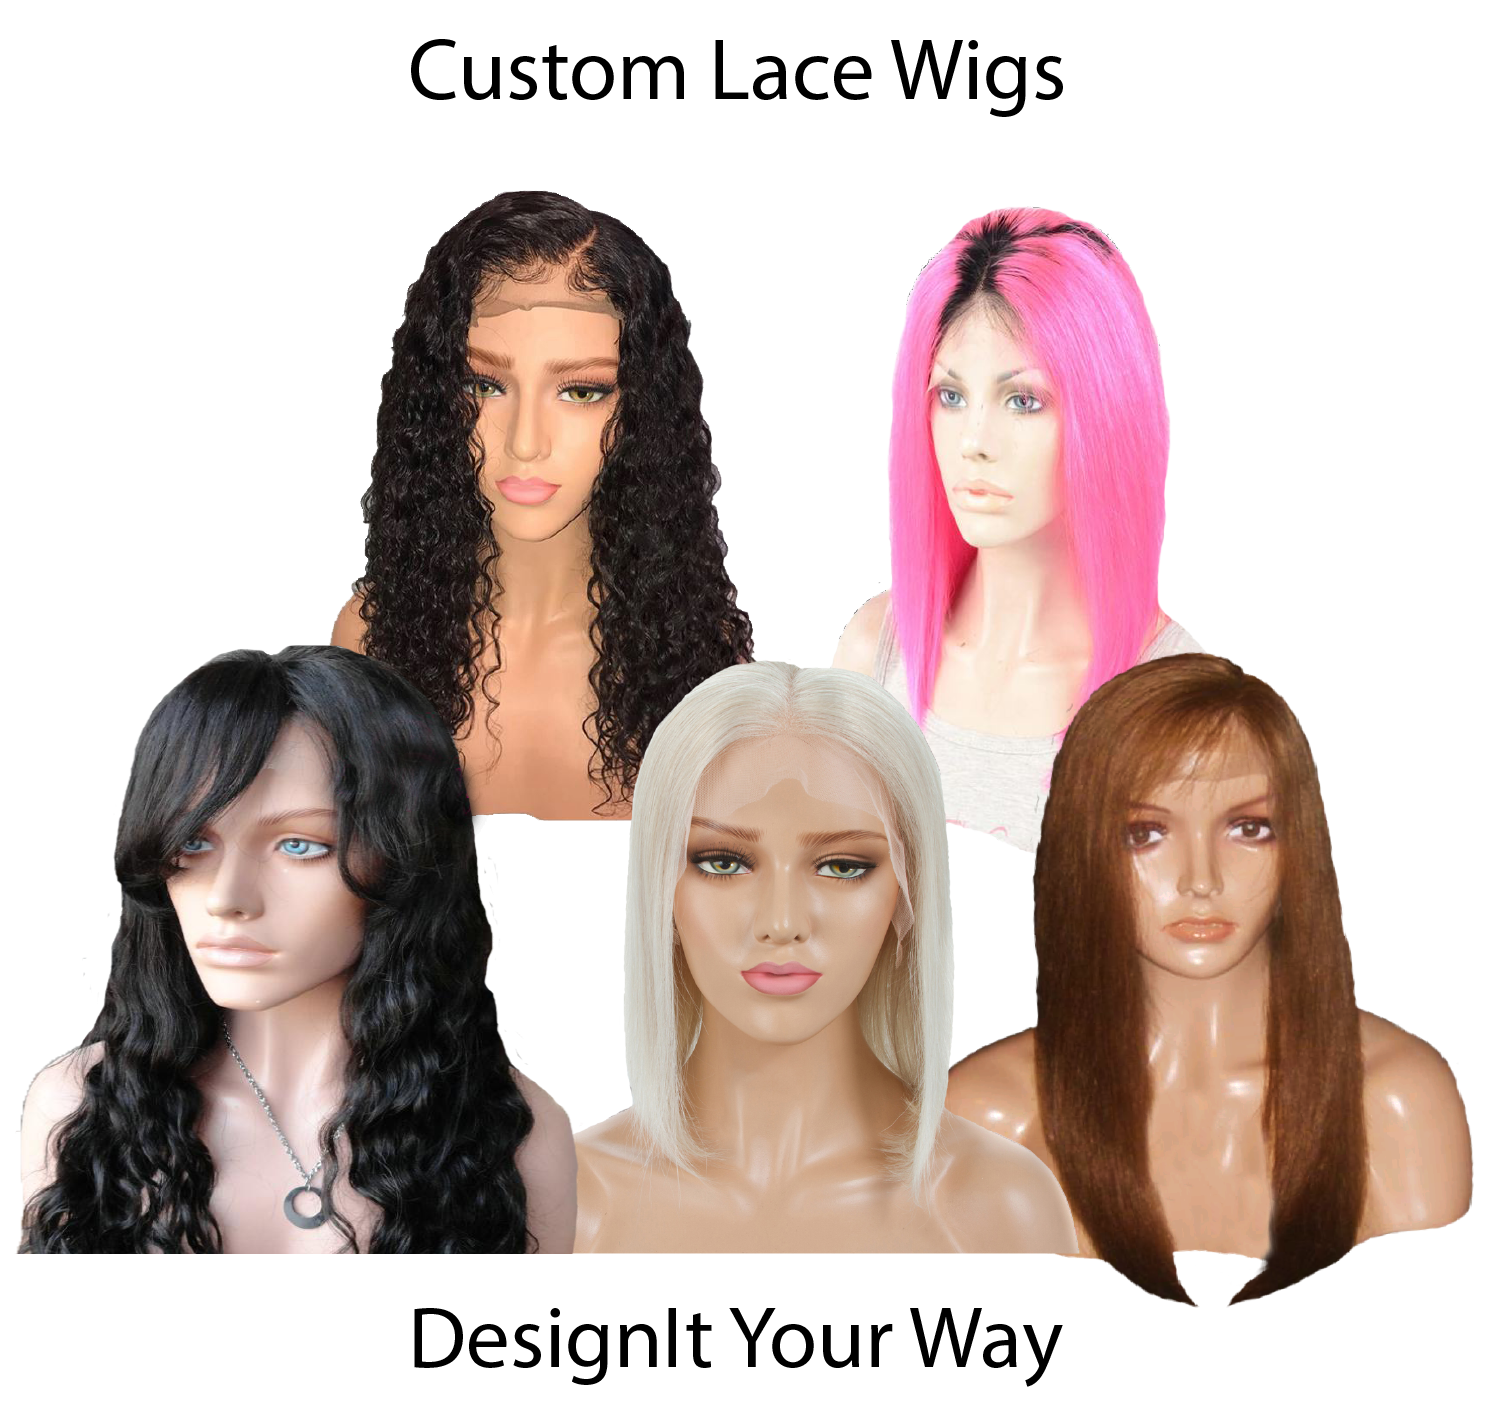 https://0201.nccdn.net/1_2/000/000/097/309/lace-wig-1486x1405.png